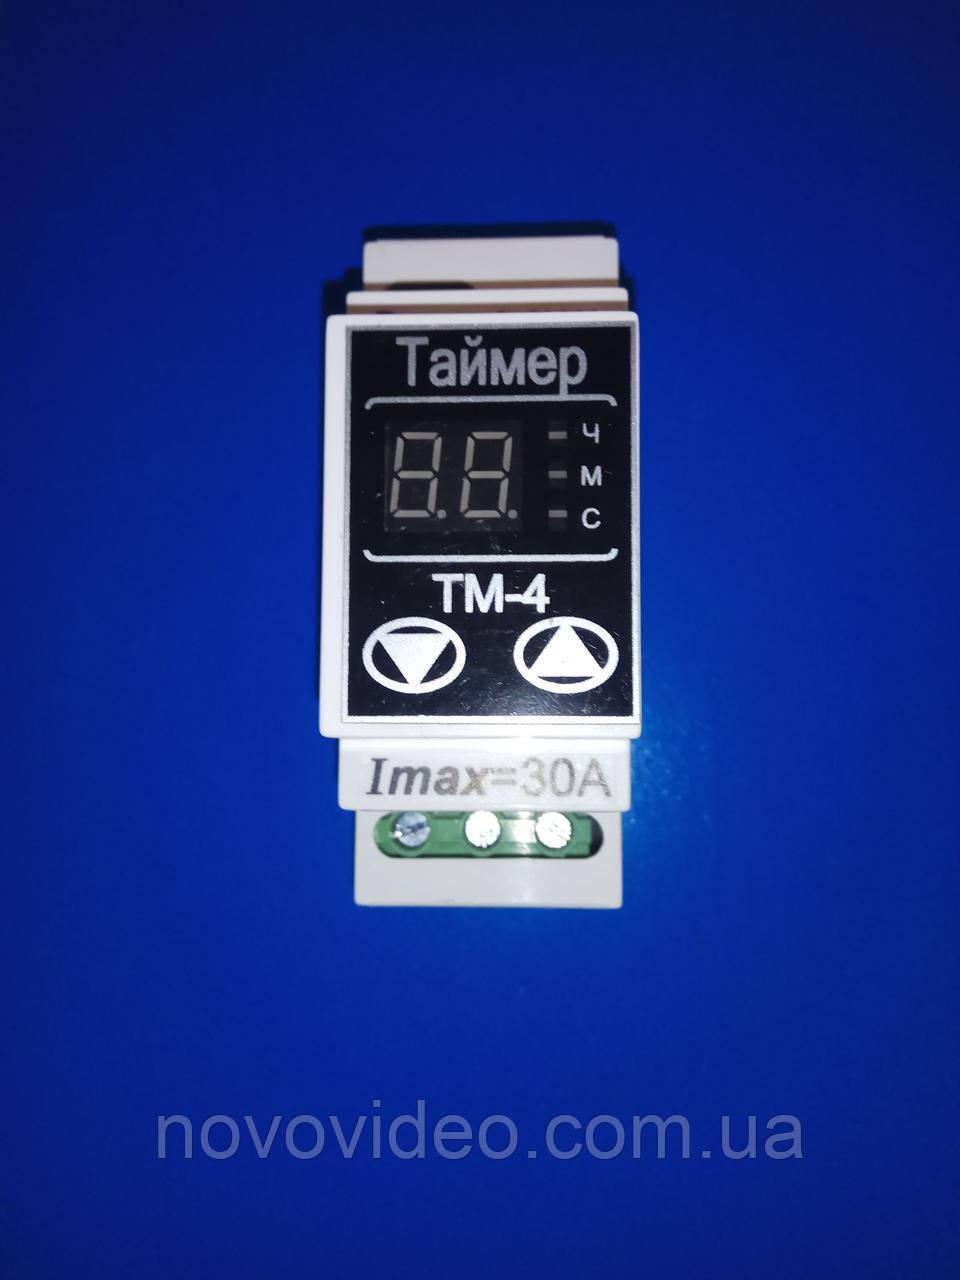 Цифровой таймер ТМ-4 на 30 А